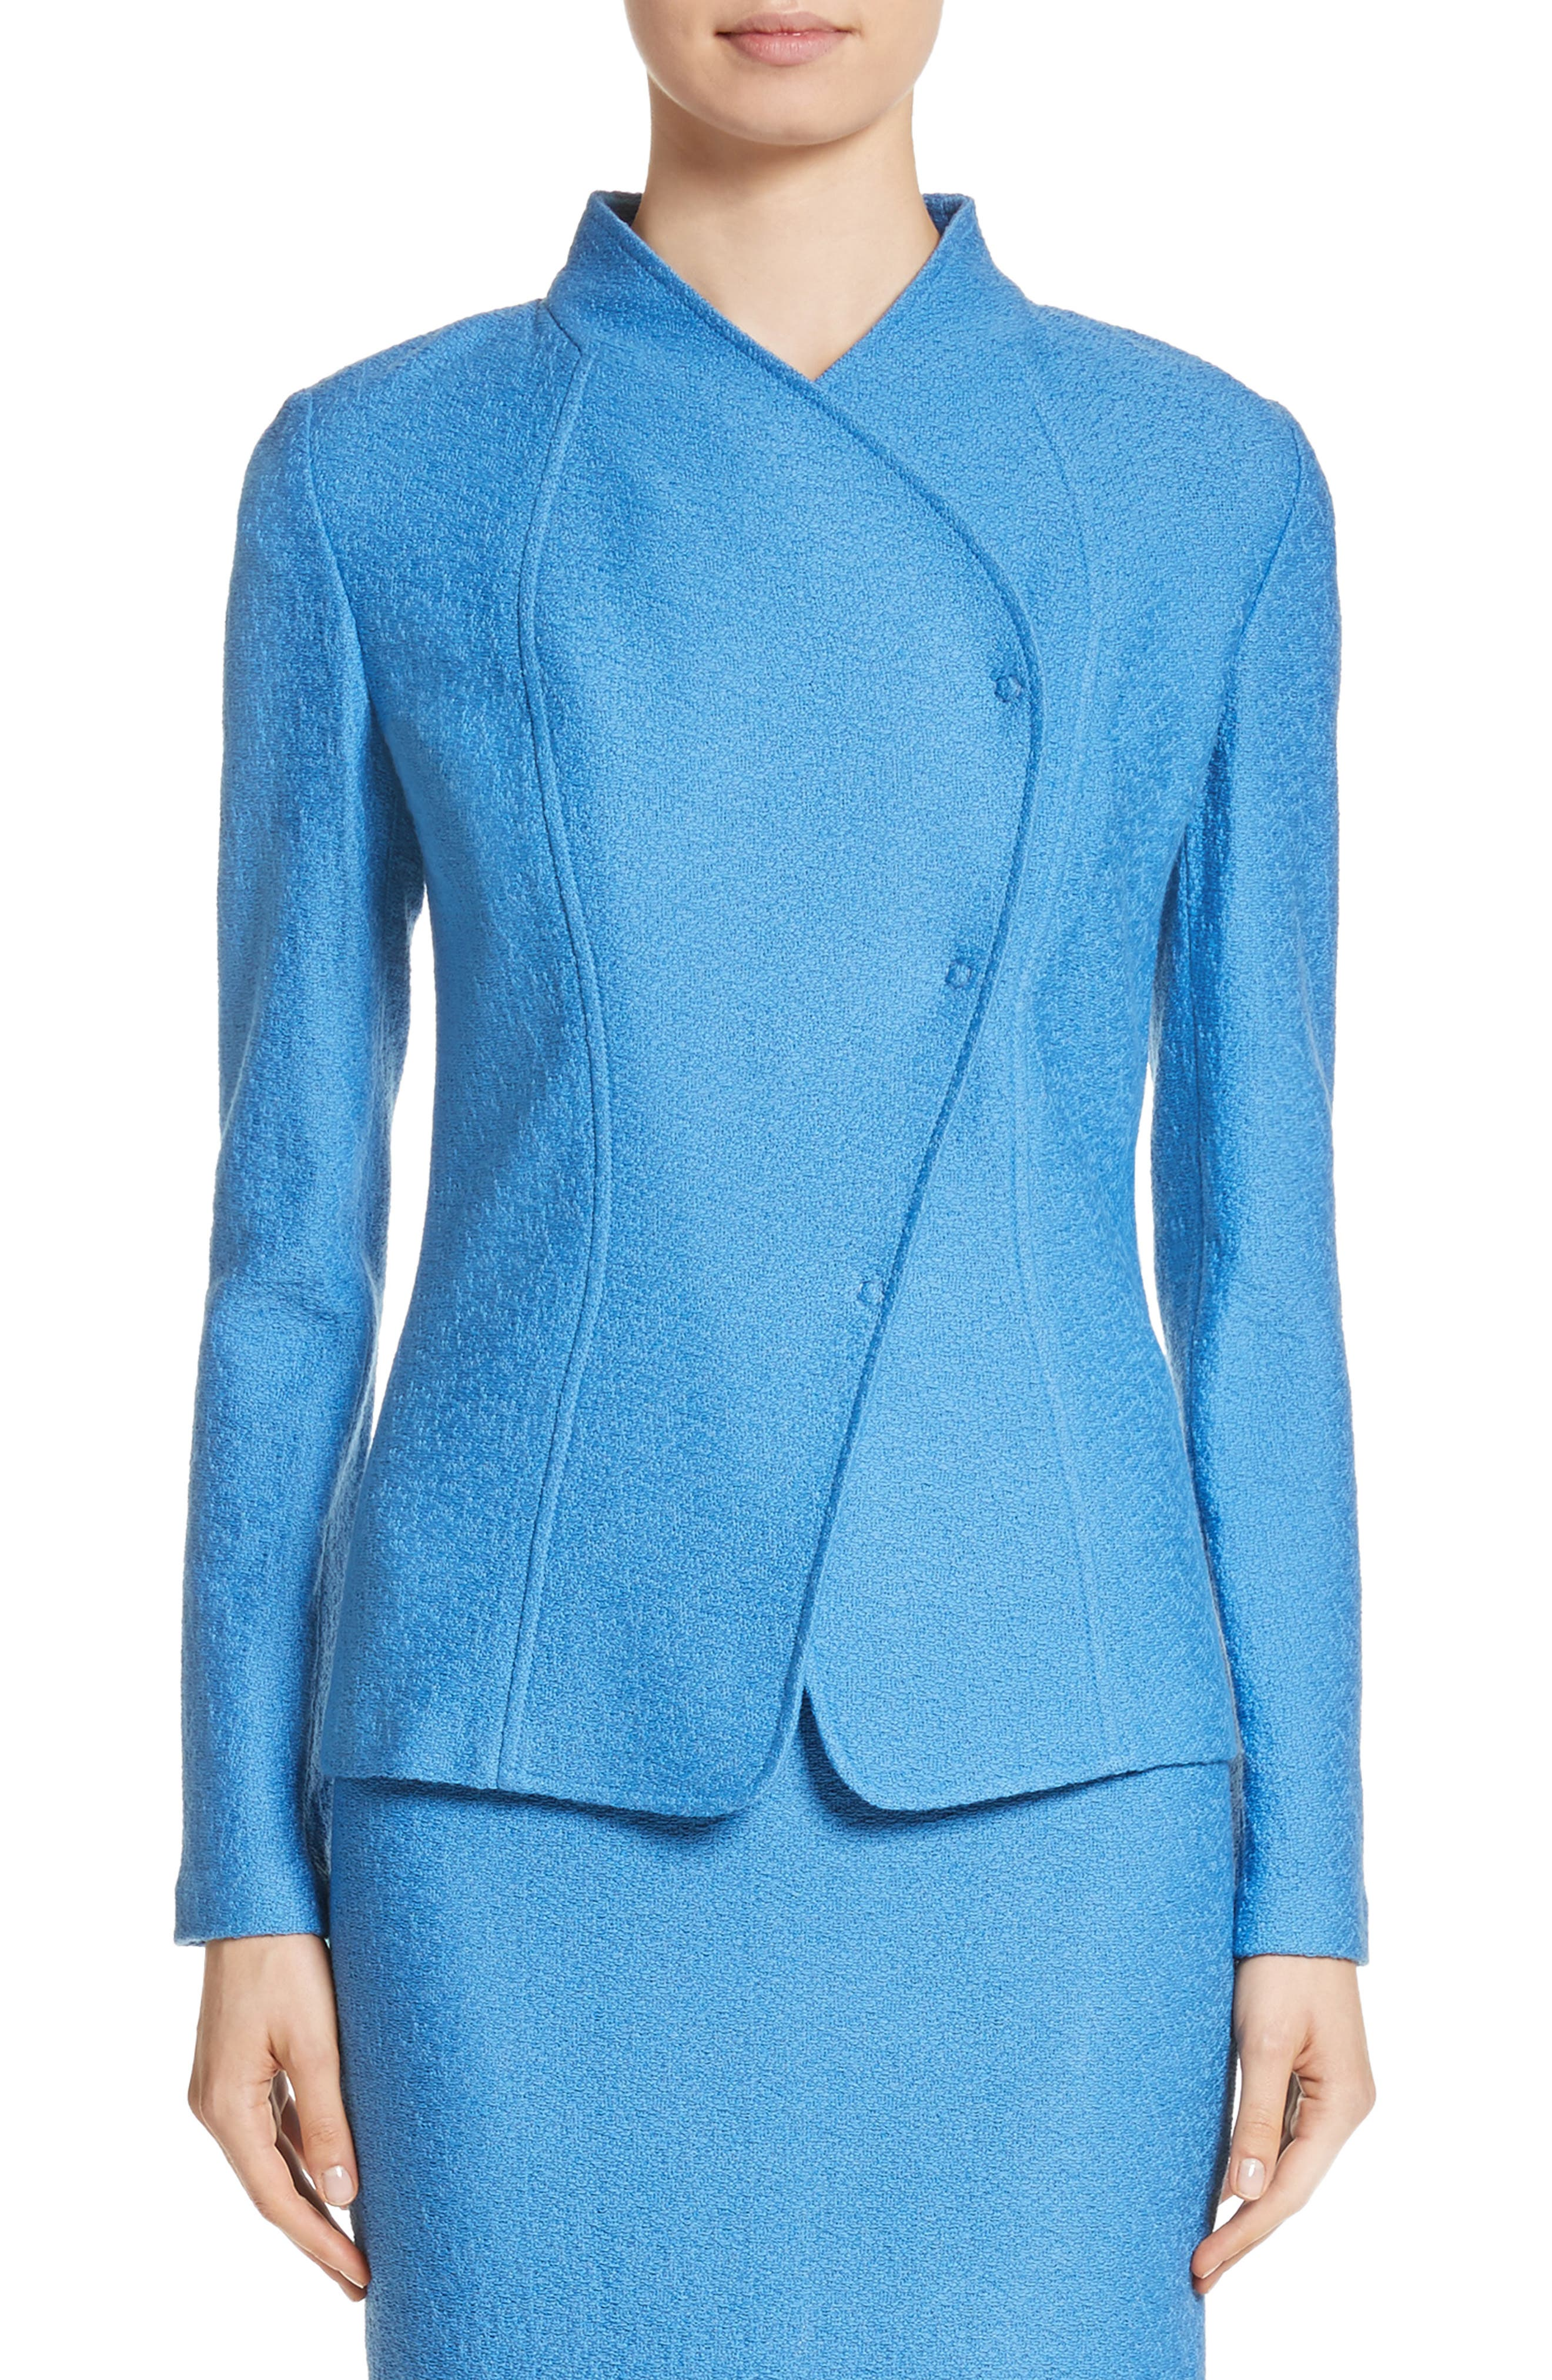 Hannah Knit Stand Collar Jacket,                         Main,                         color, 420